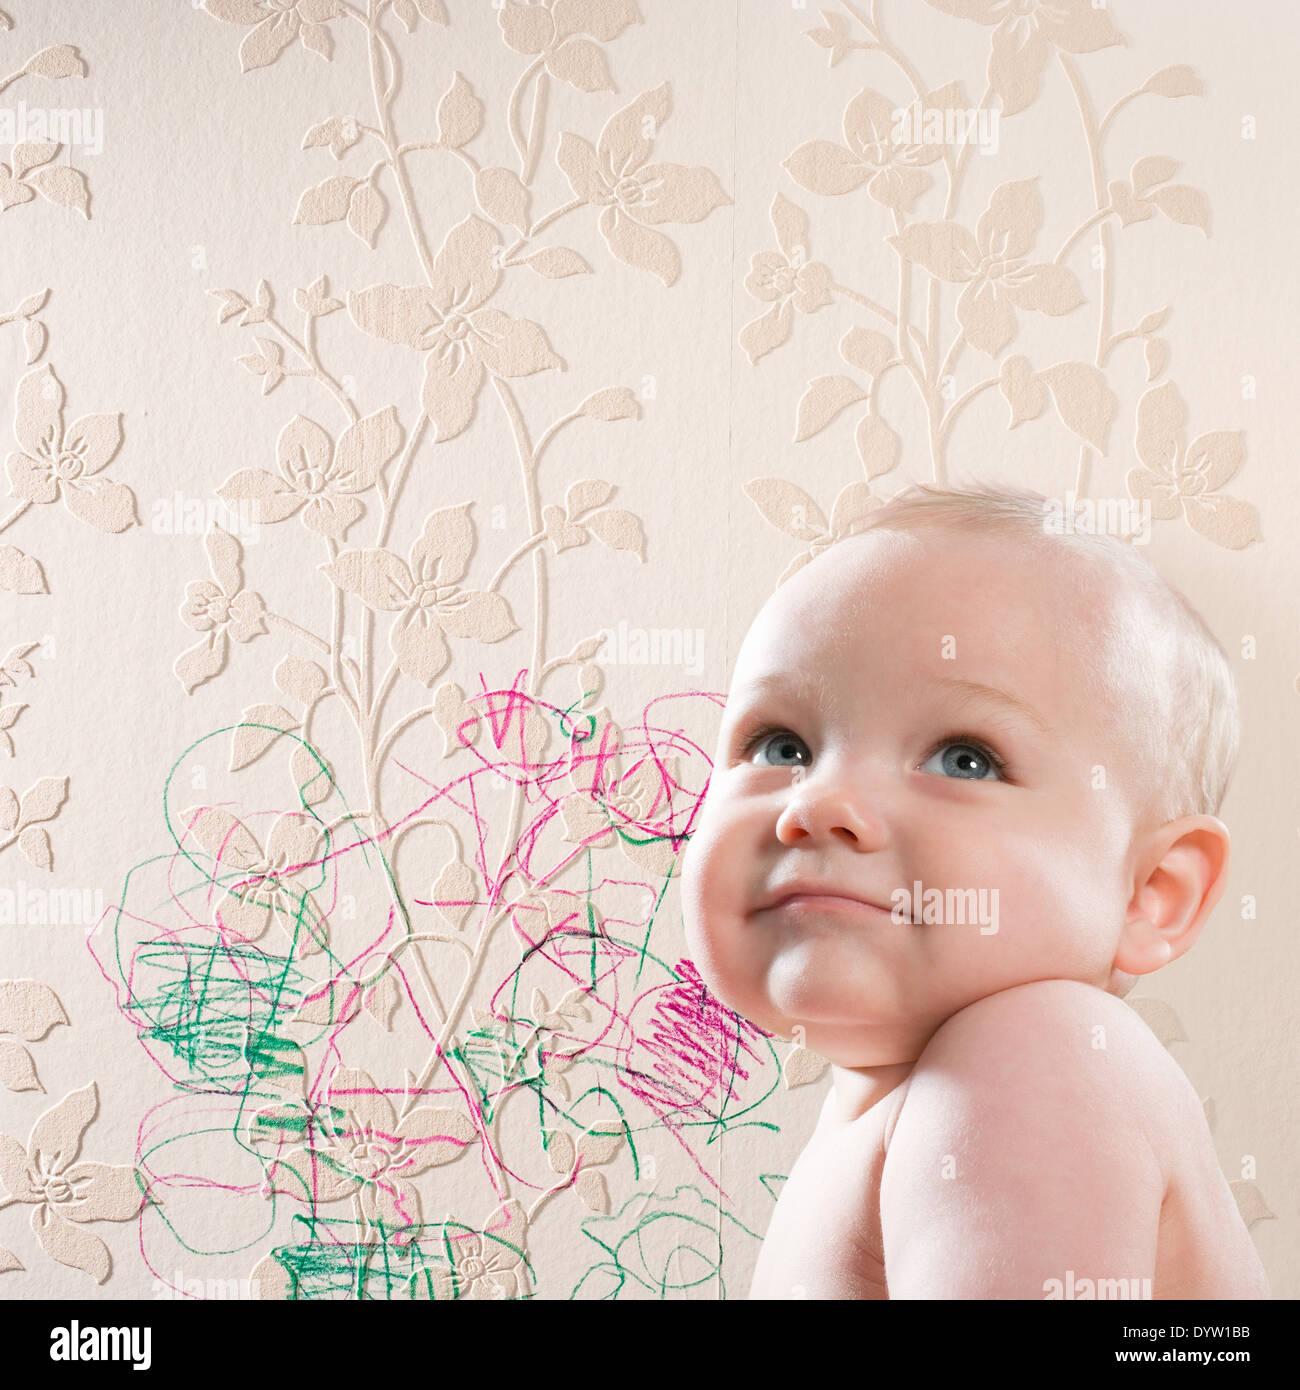 Cheeky baby - Stock Image